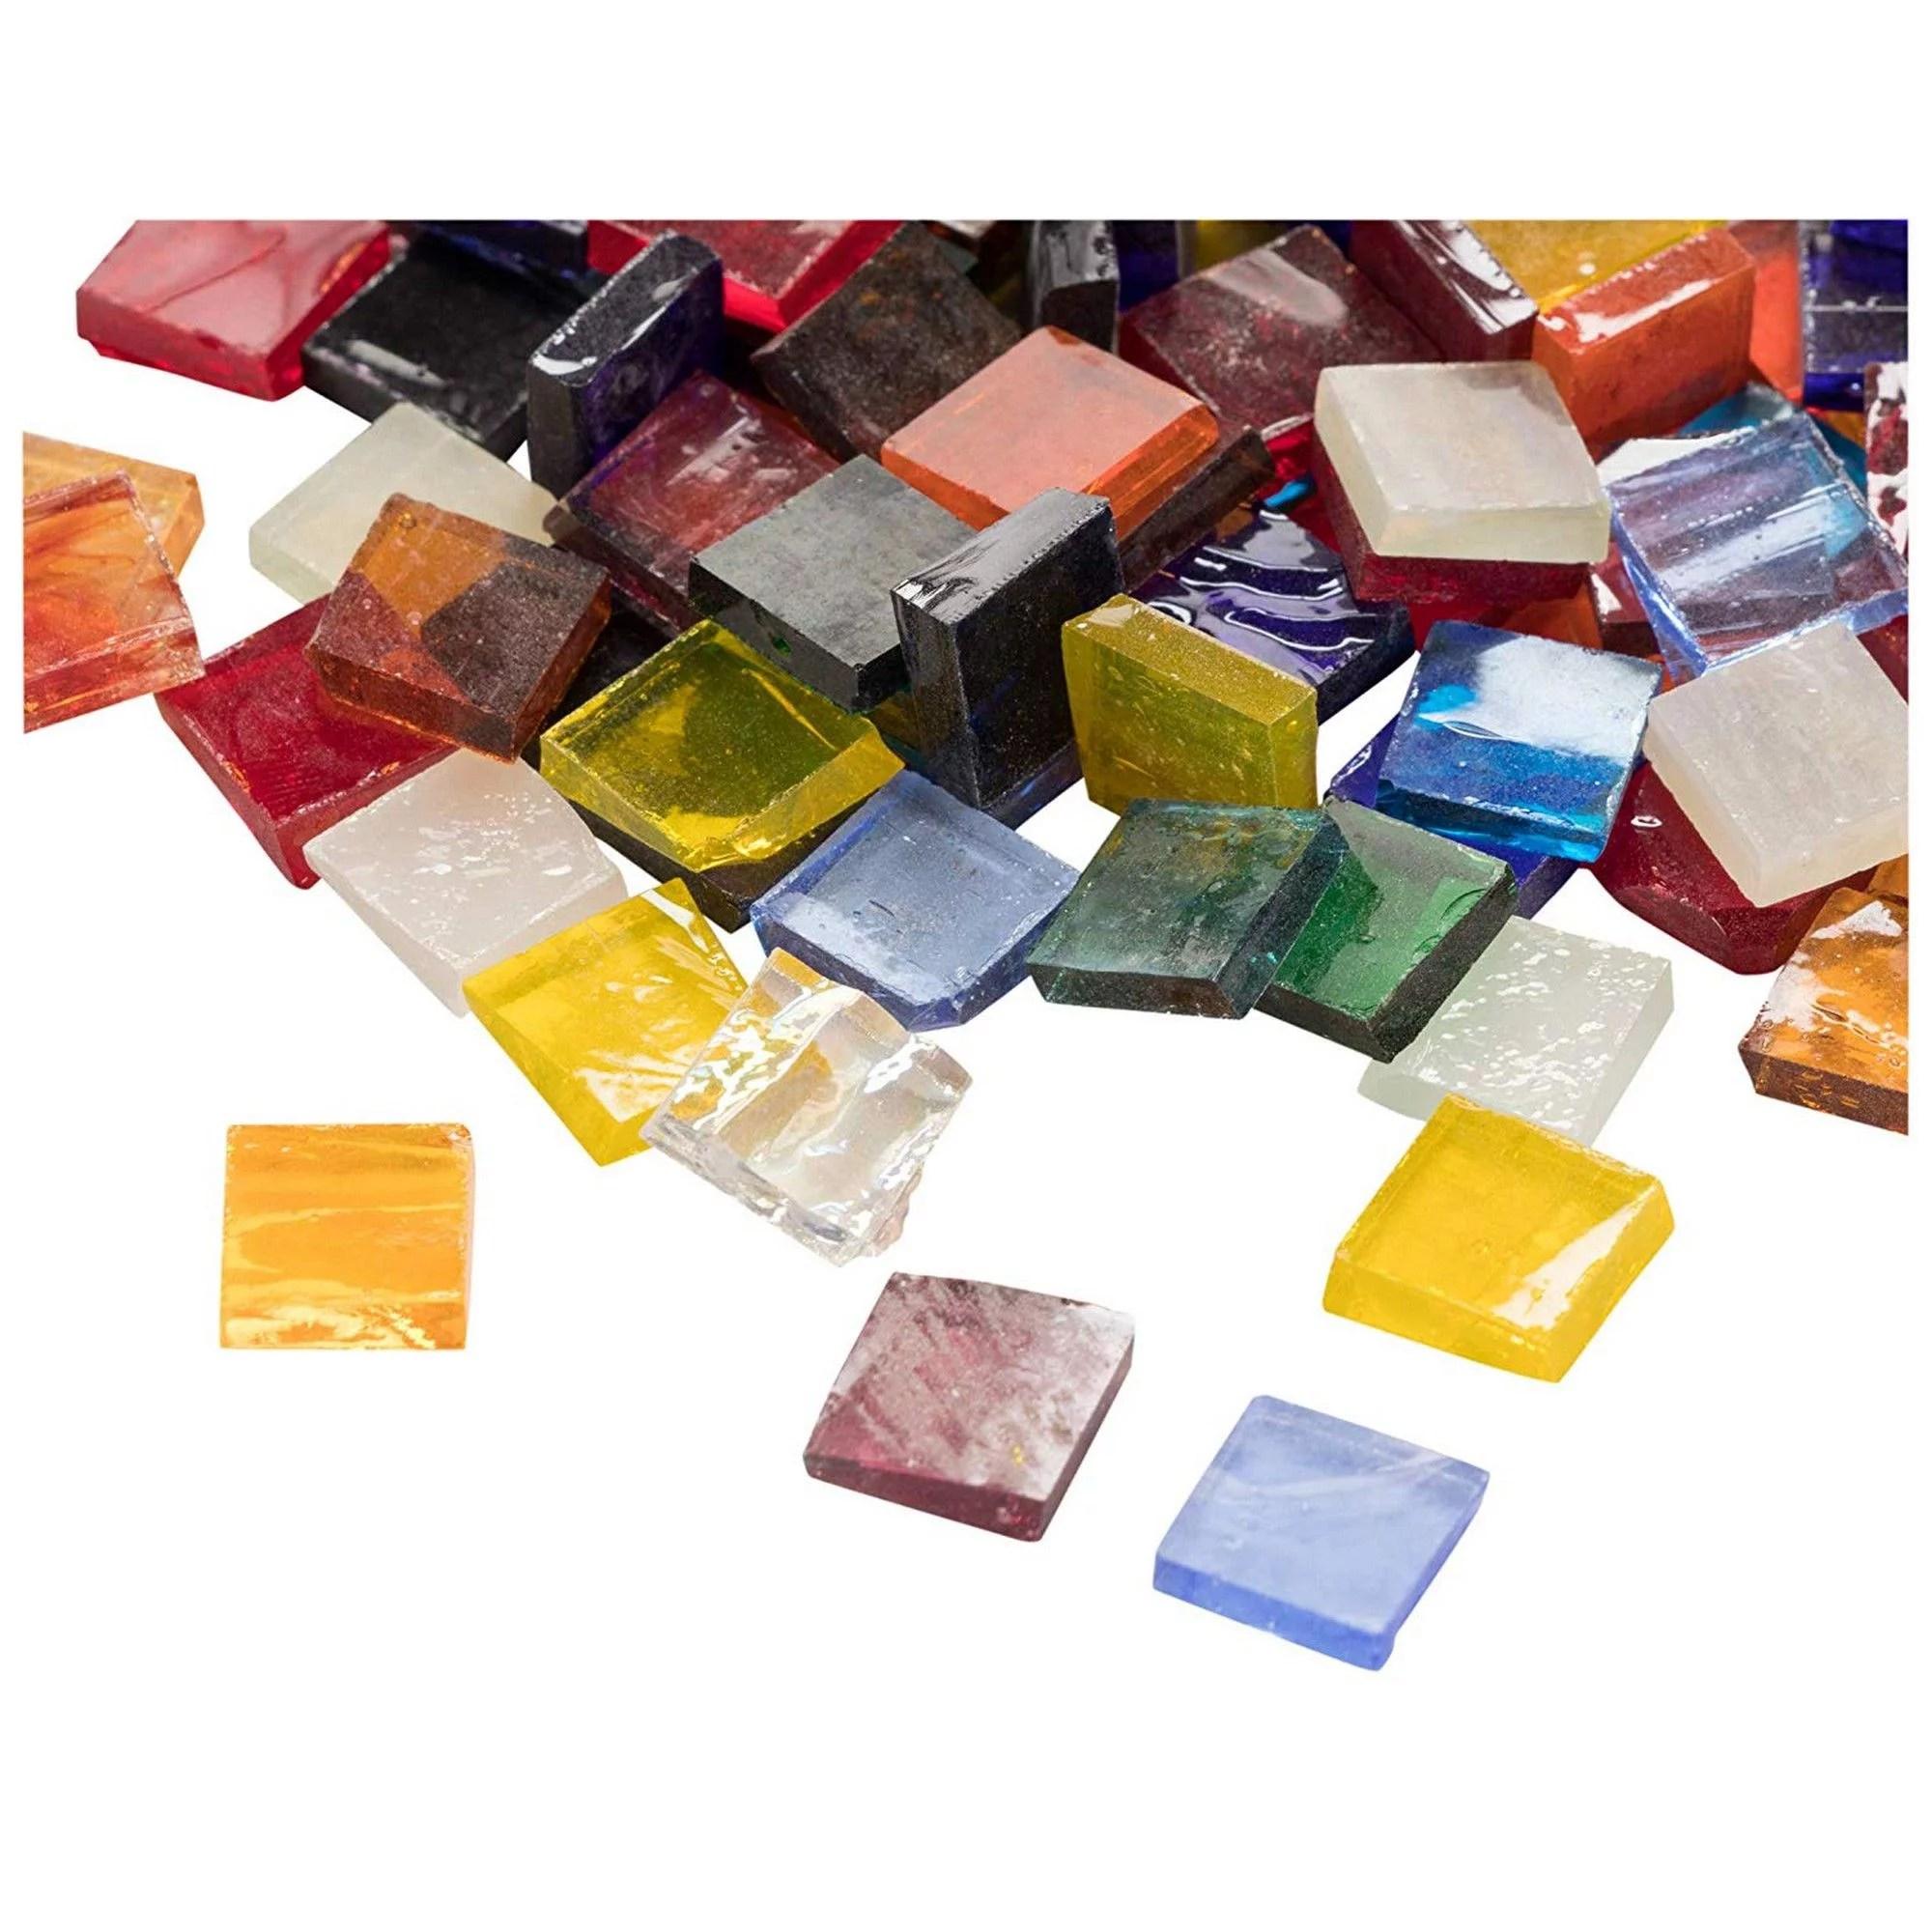 mosaic tiles 1000 pack glass mosaic pieces mosaic chips stained glass mosaic textured glass mosaic for decoration craft diy art projects